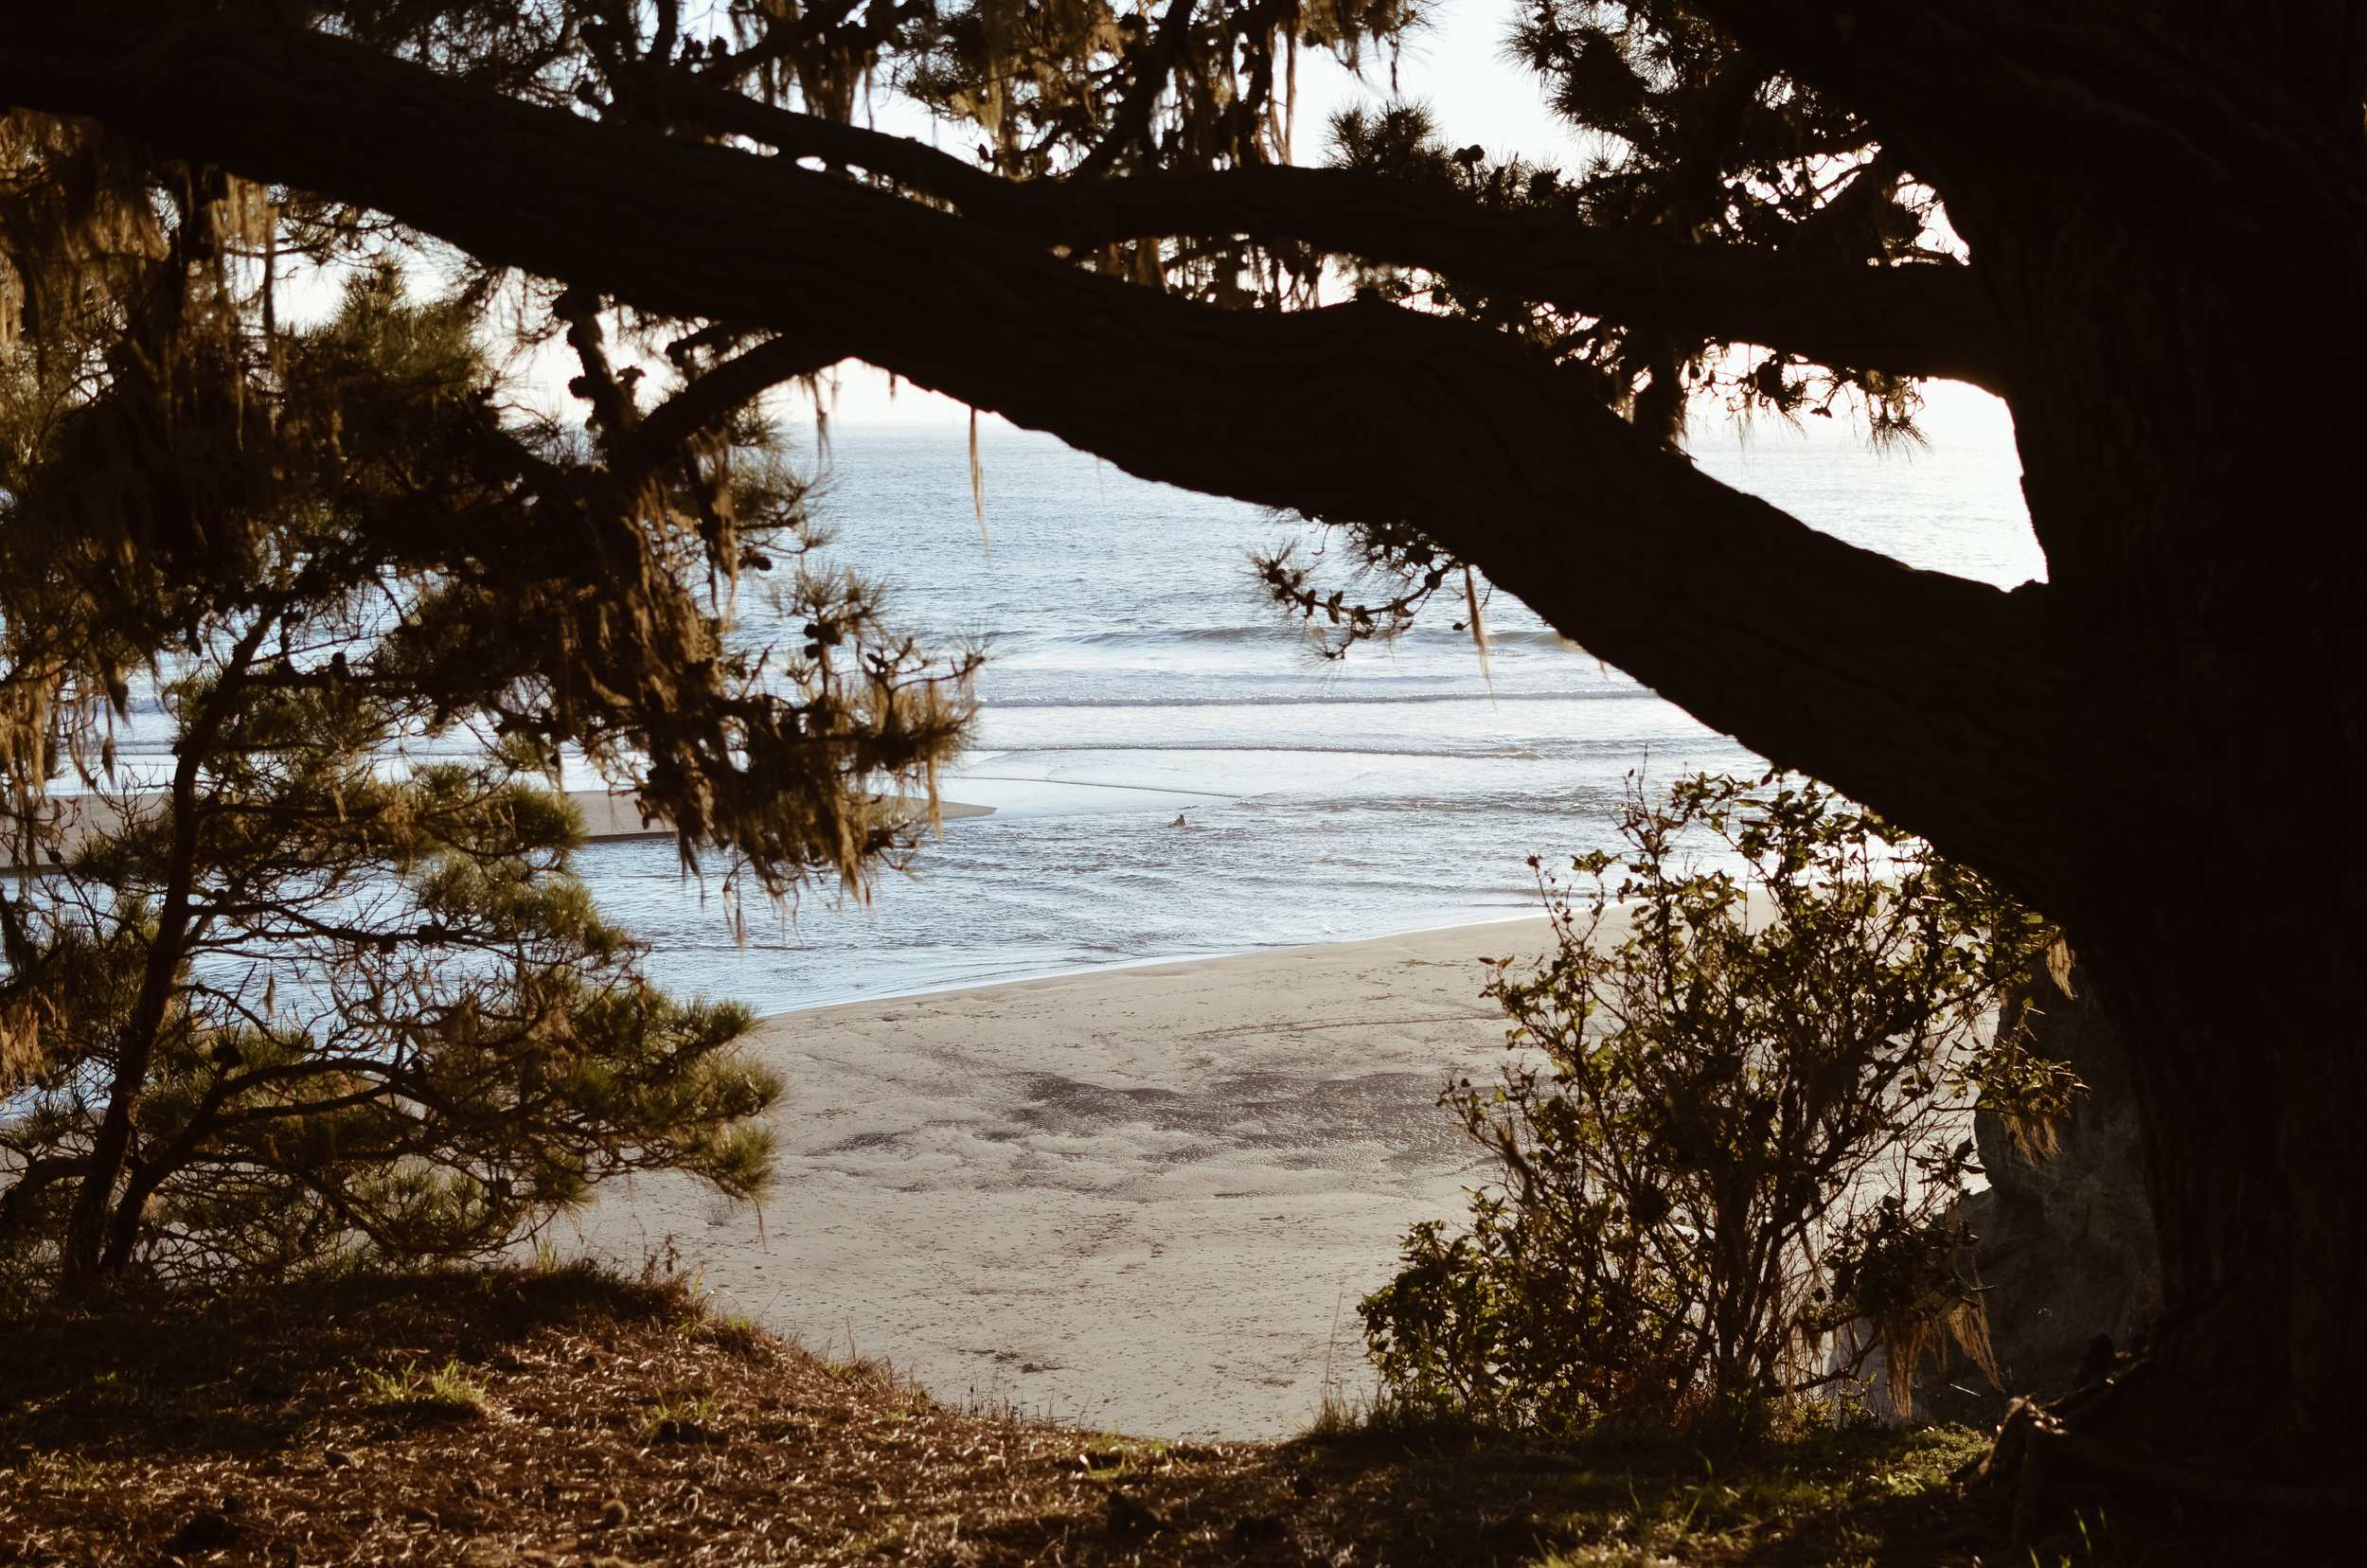 mendocino+kate+parrish+life+on+pine_DSC_0066.jpg